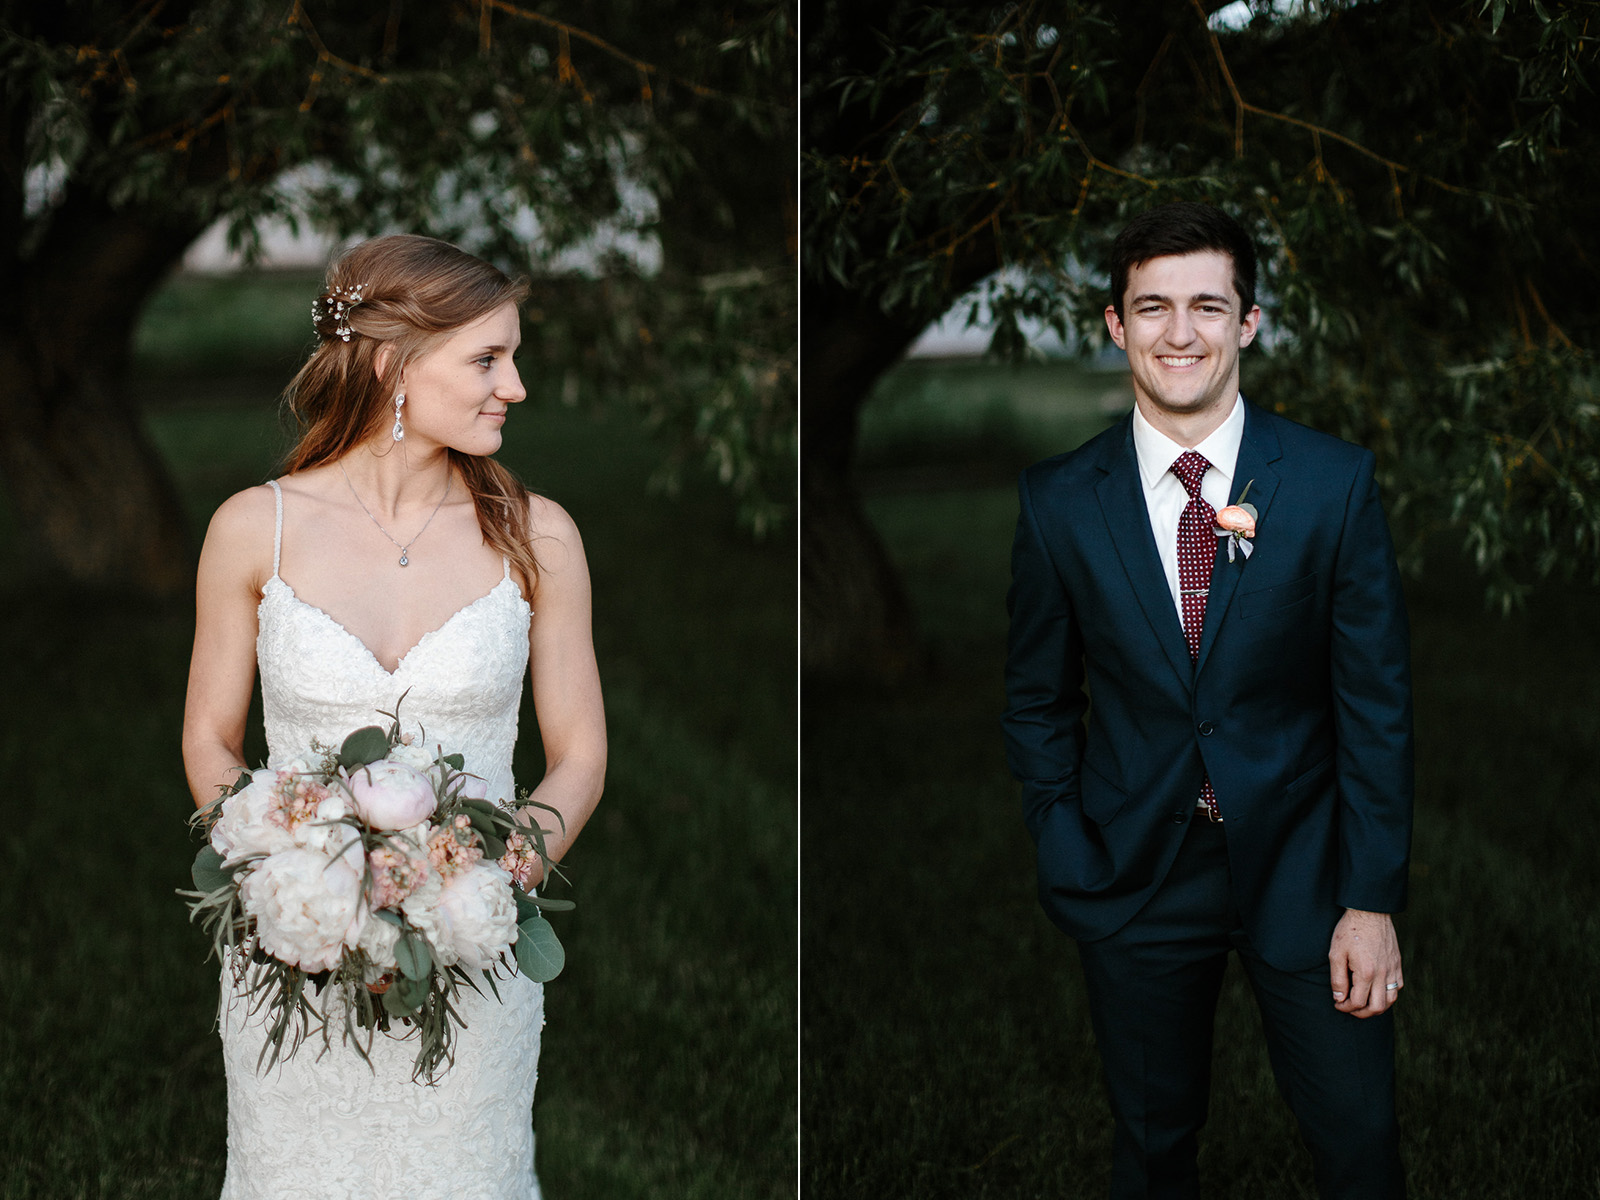 wedding-elopement-adventerous-romantic-timeless-south-dakota-blue-haven-barn-093.jpg